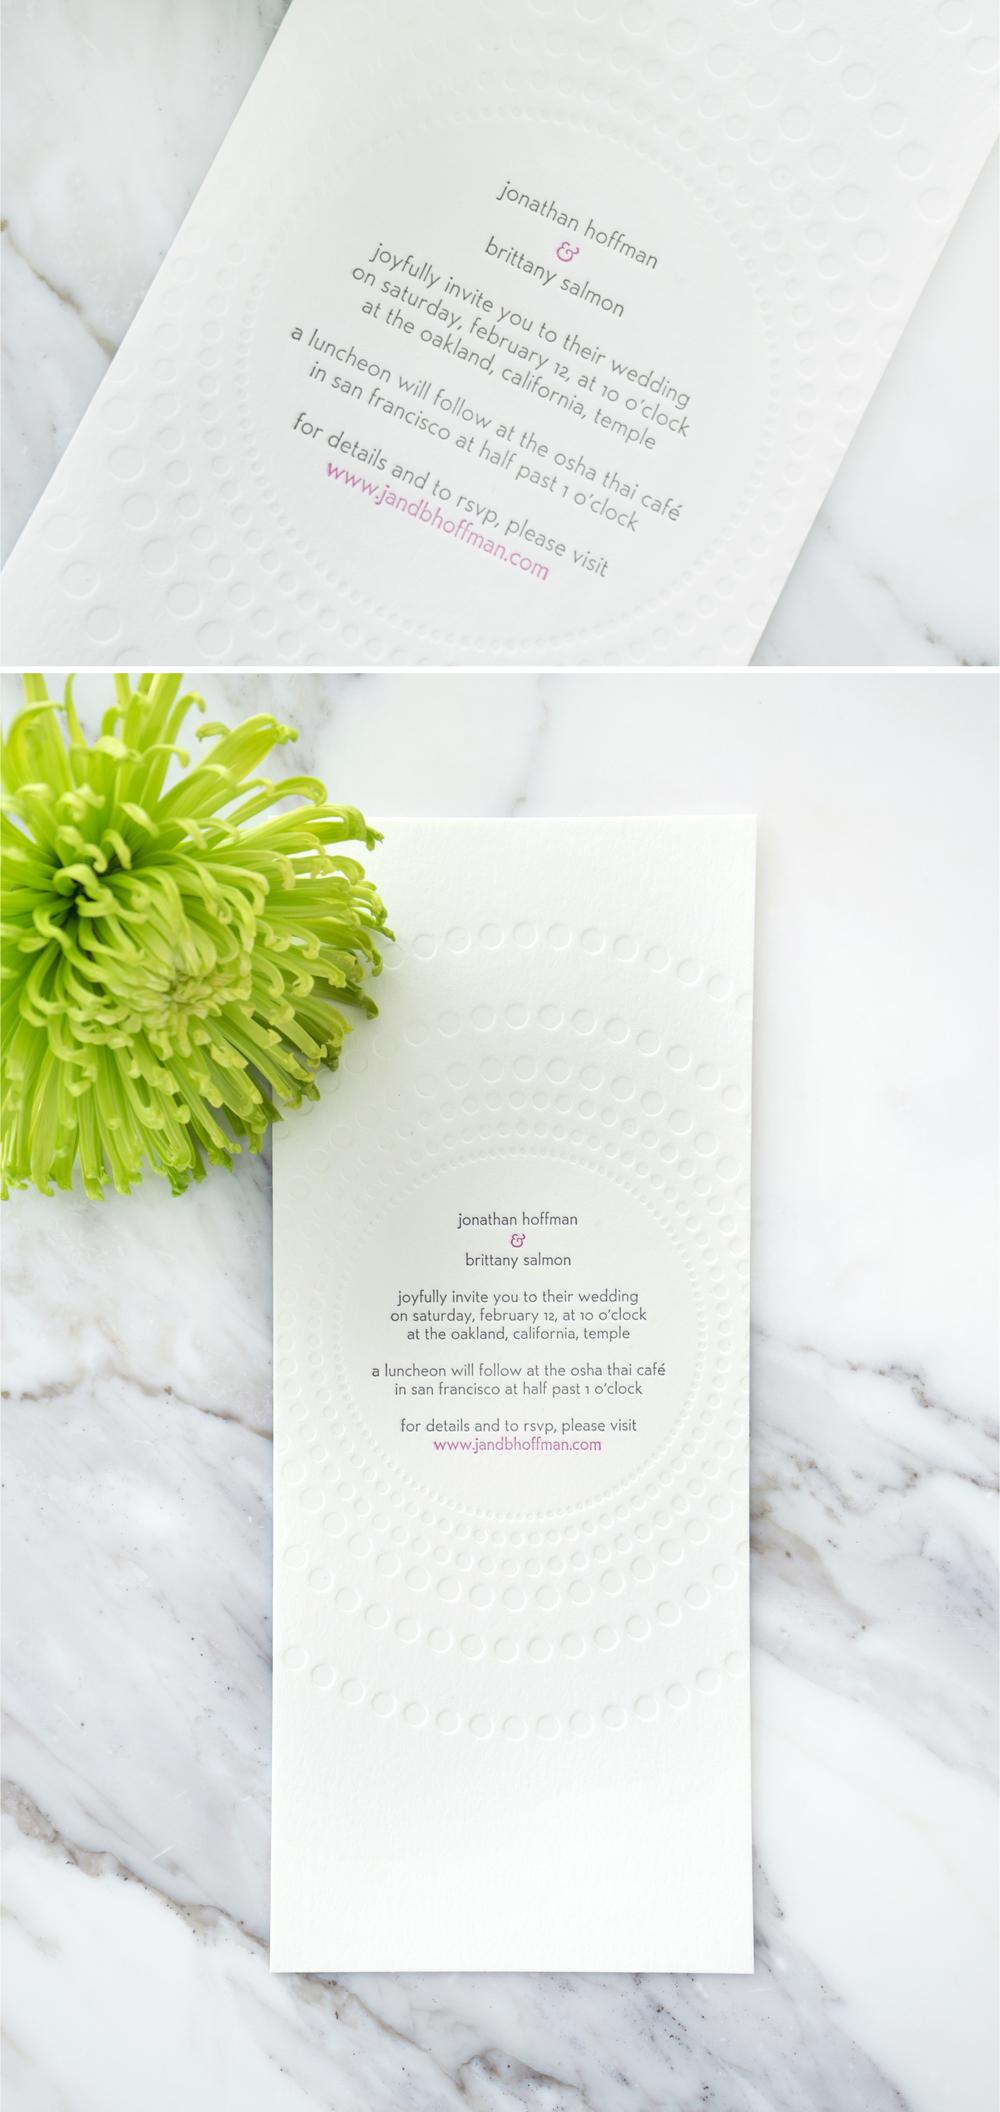 Jonathan & Brittany Wedding Invitation — Brittany Alise Hoffman